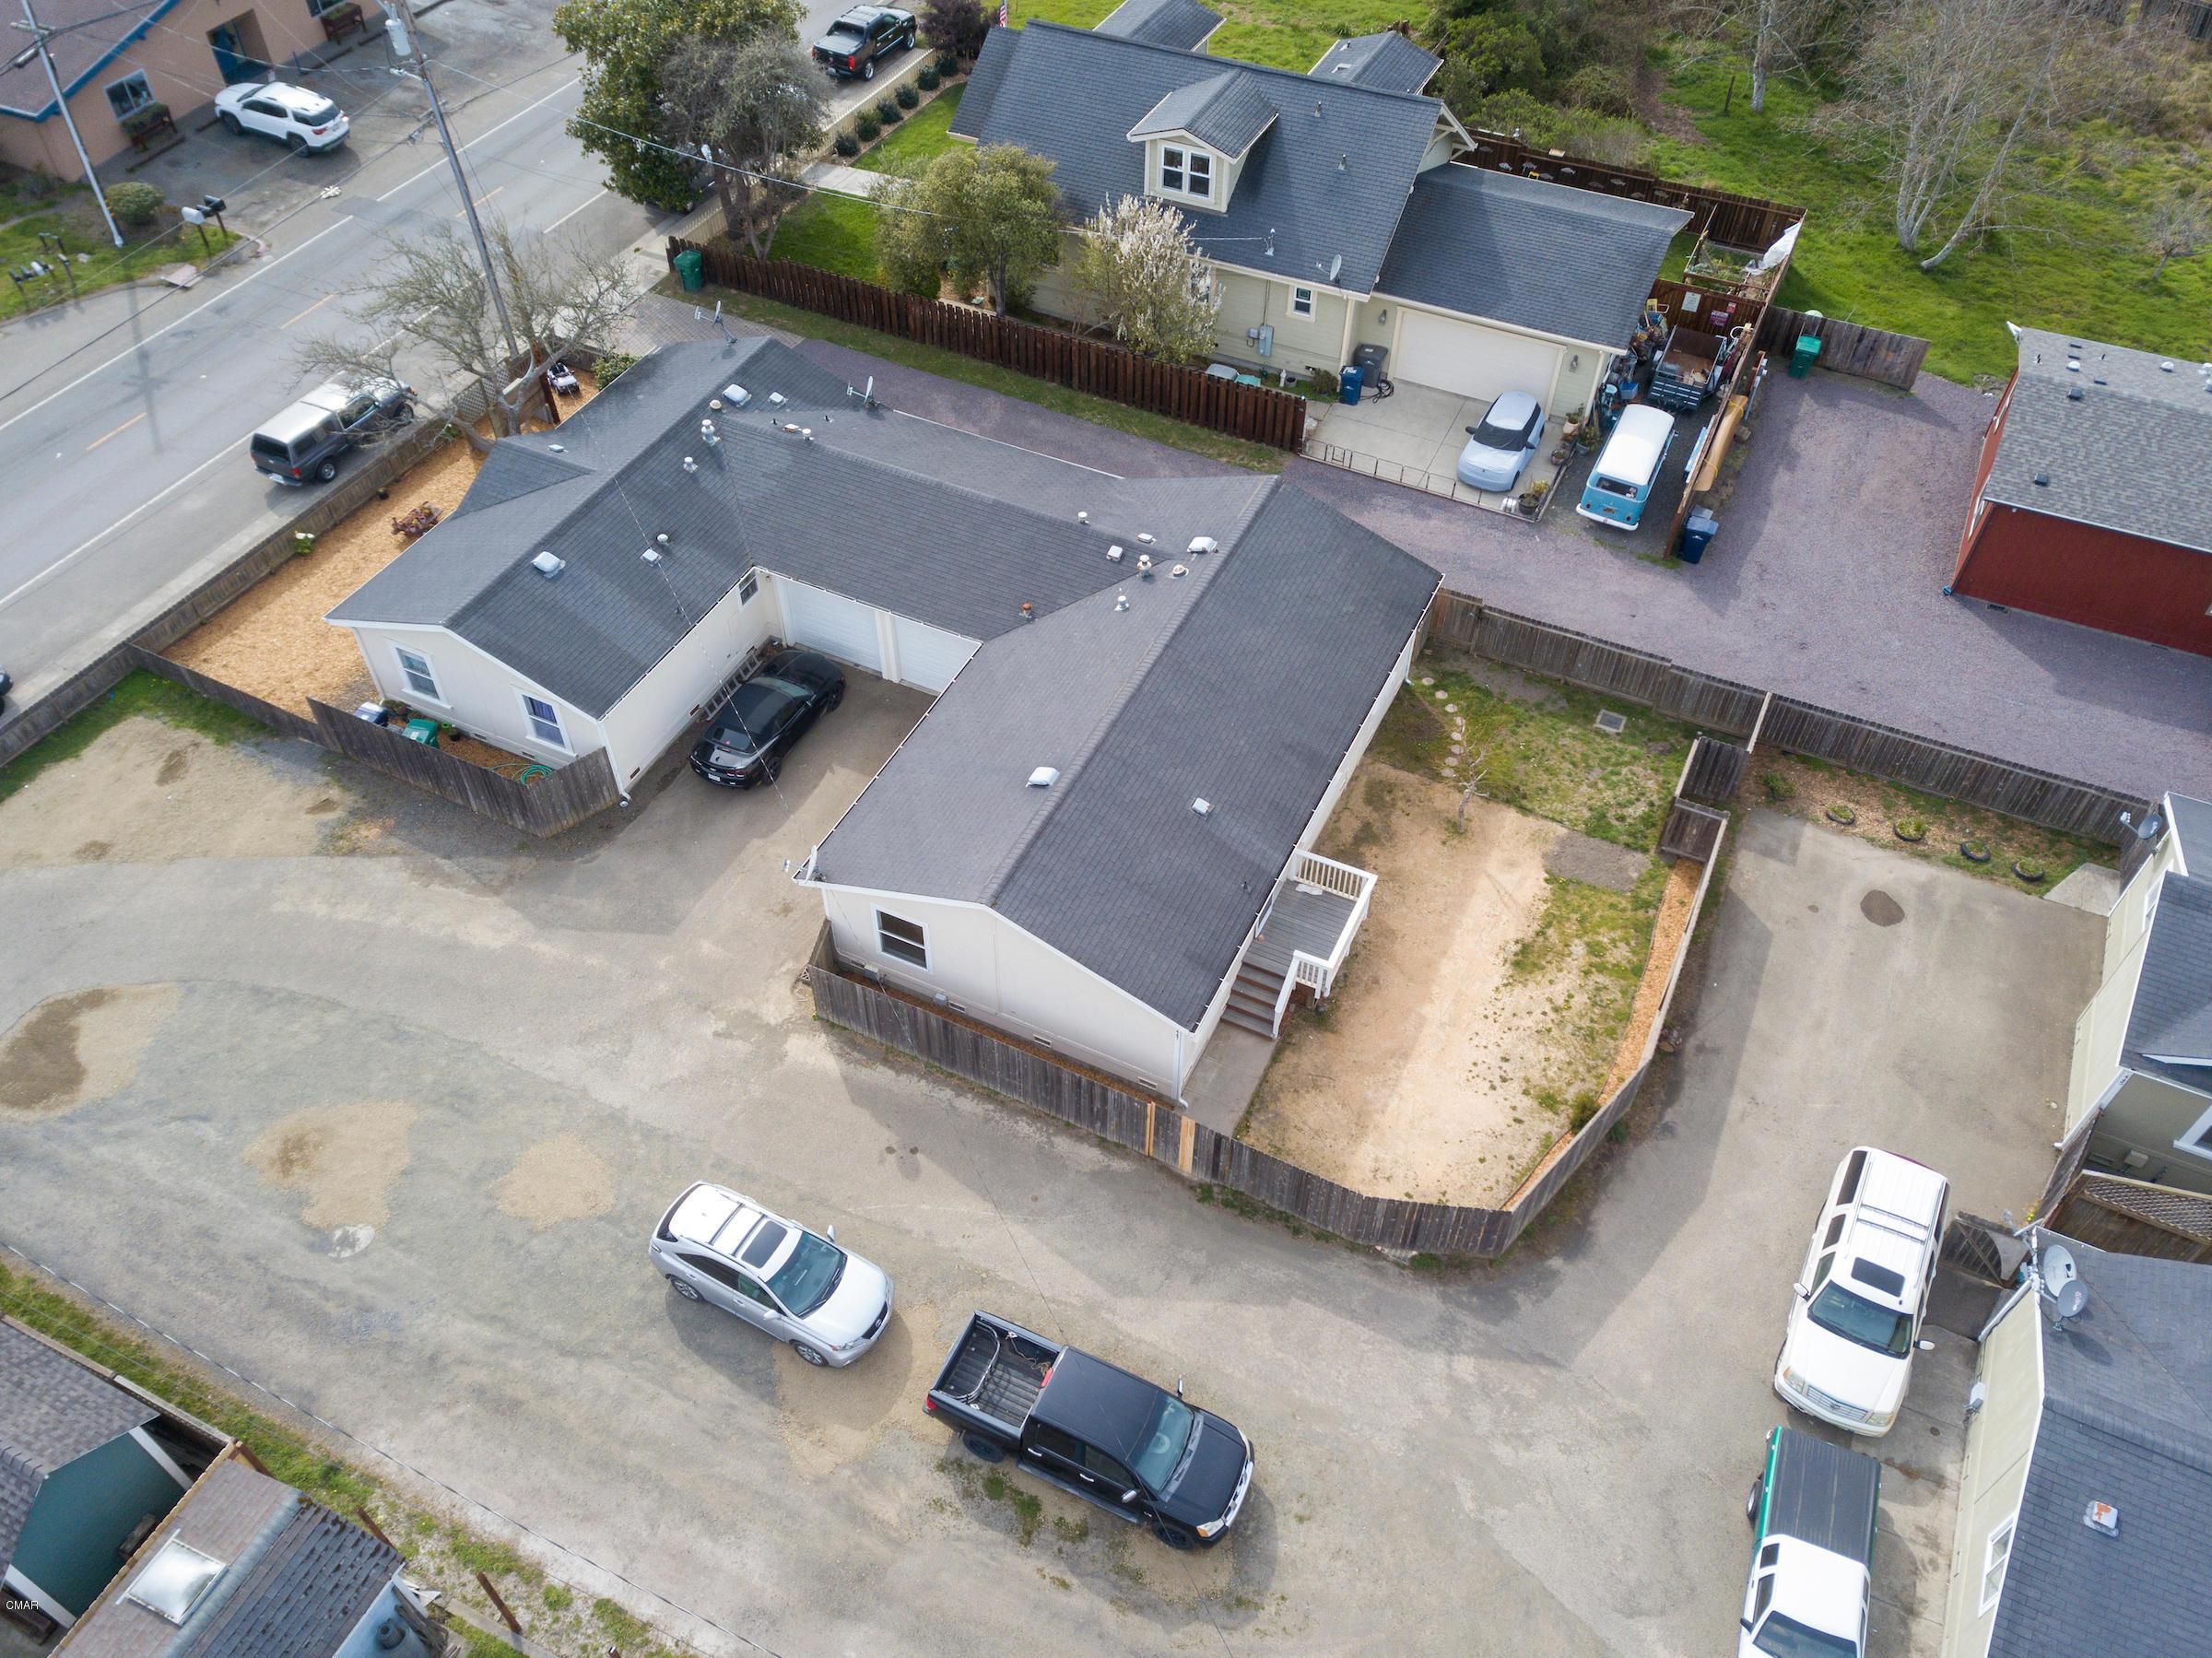 1447/1449 Oak, Fort Bragg, CA, 95437